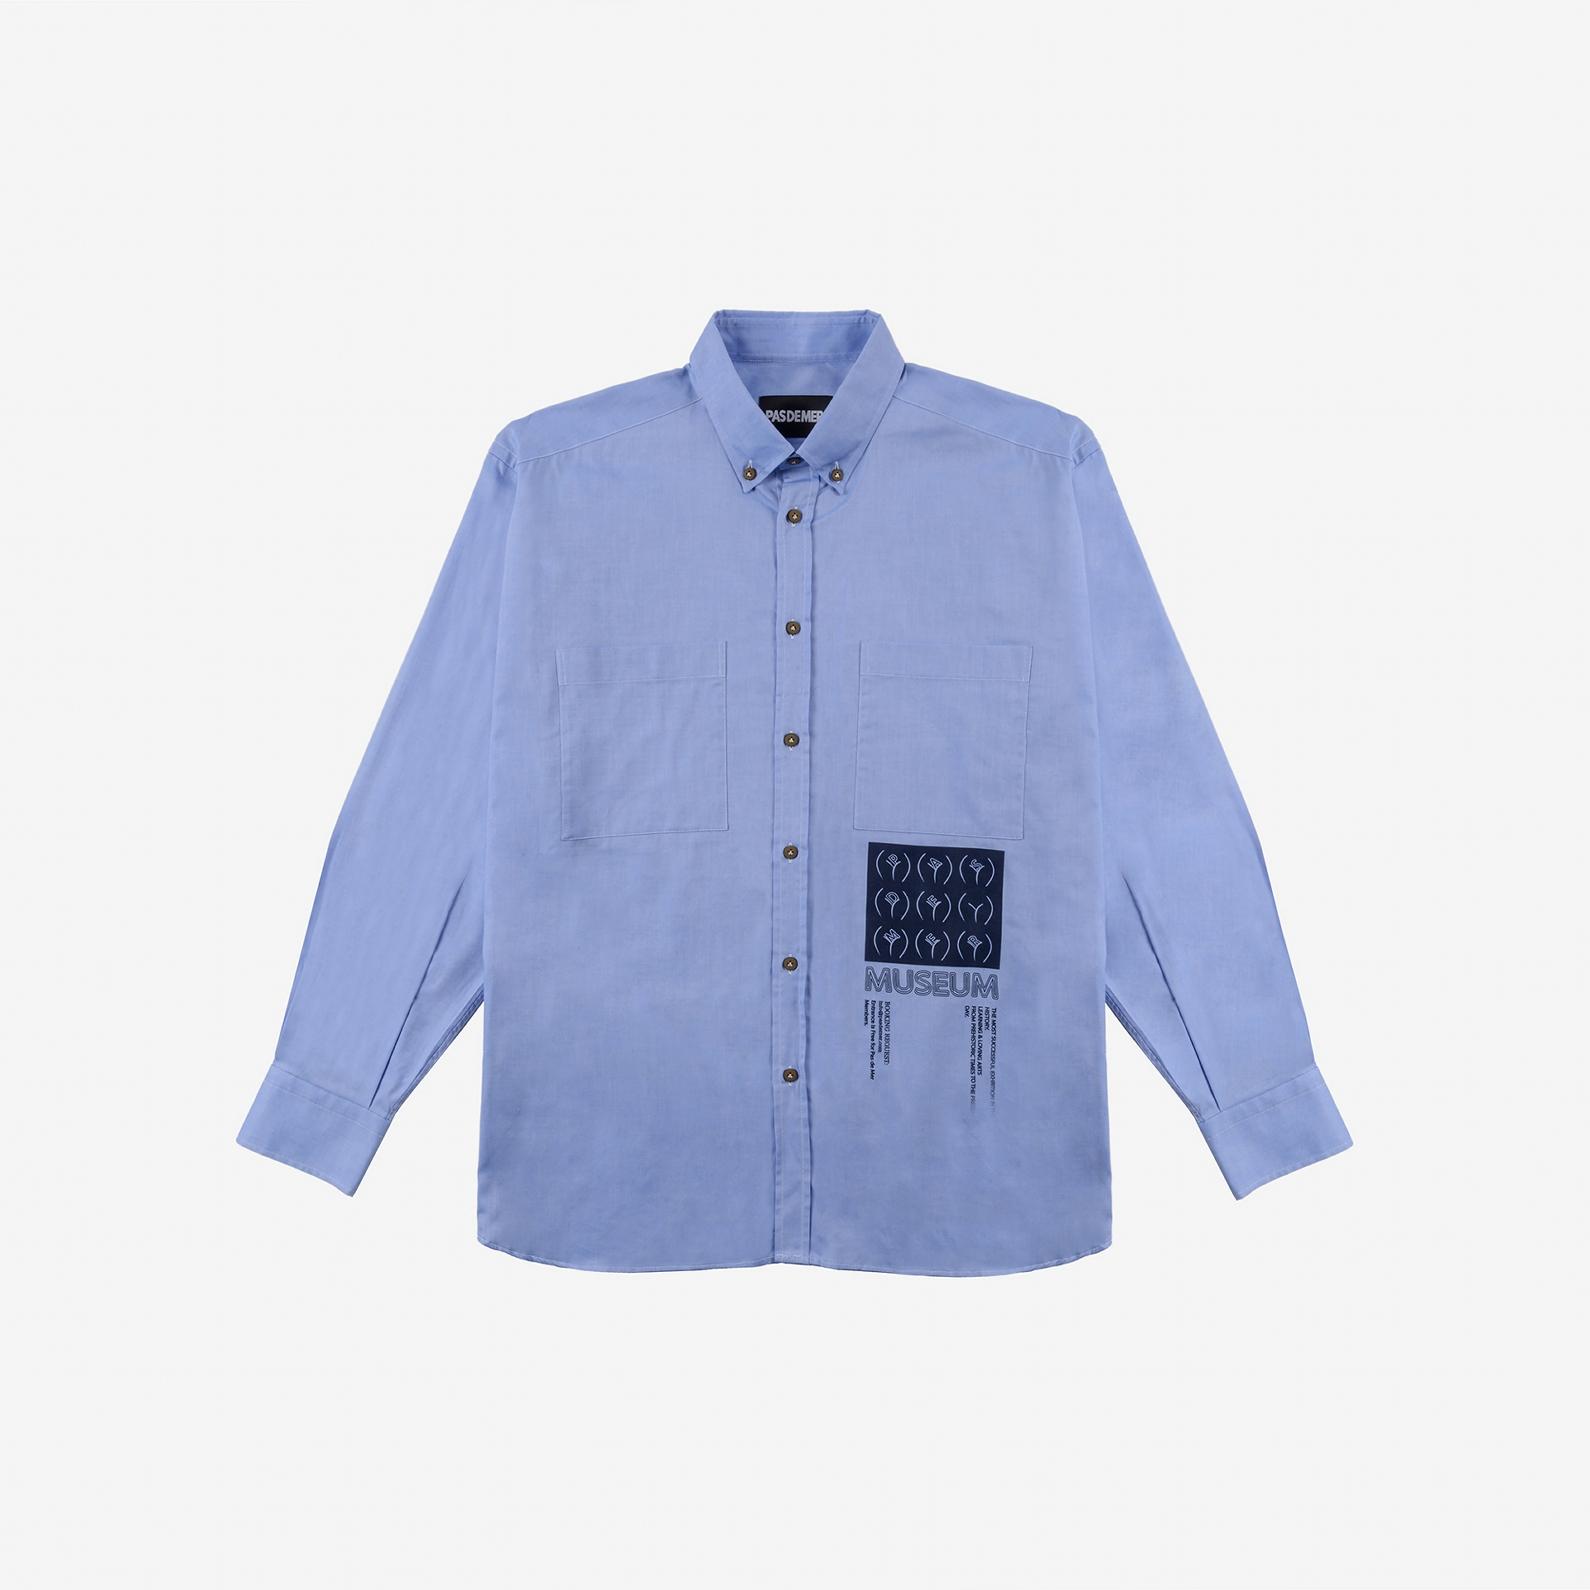 【PAS DE MER/パドゥメ】MUSEUM SHIRT 長袖シャツ / LIGHT BLUE